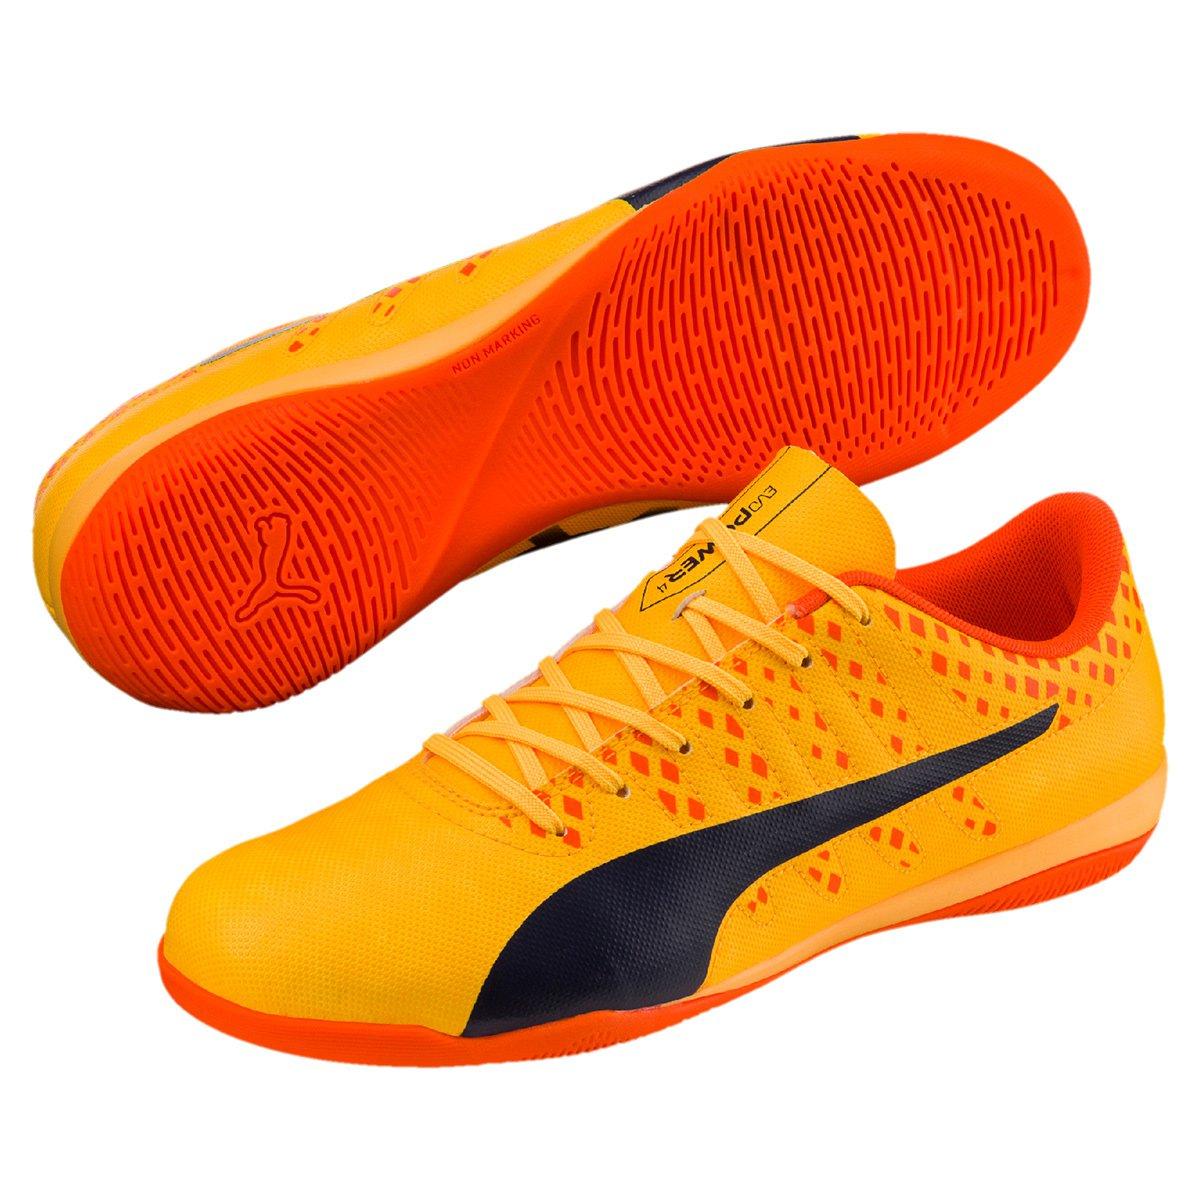 d4fdbc2e7fffe Chuteira Futsal Puma Evopower Vigor 4 IT Masculina - Compre Agora ...